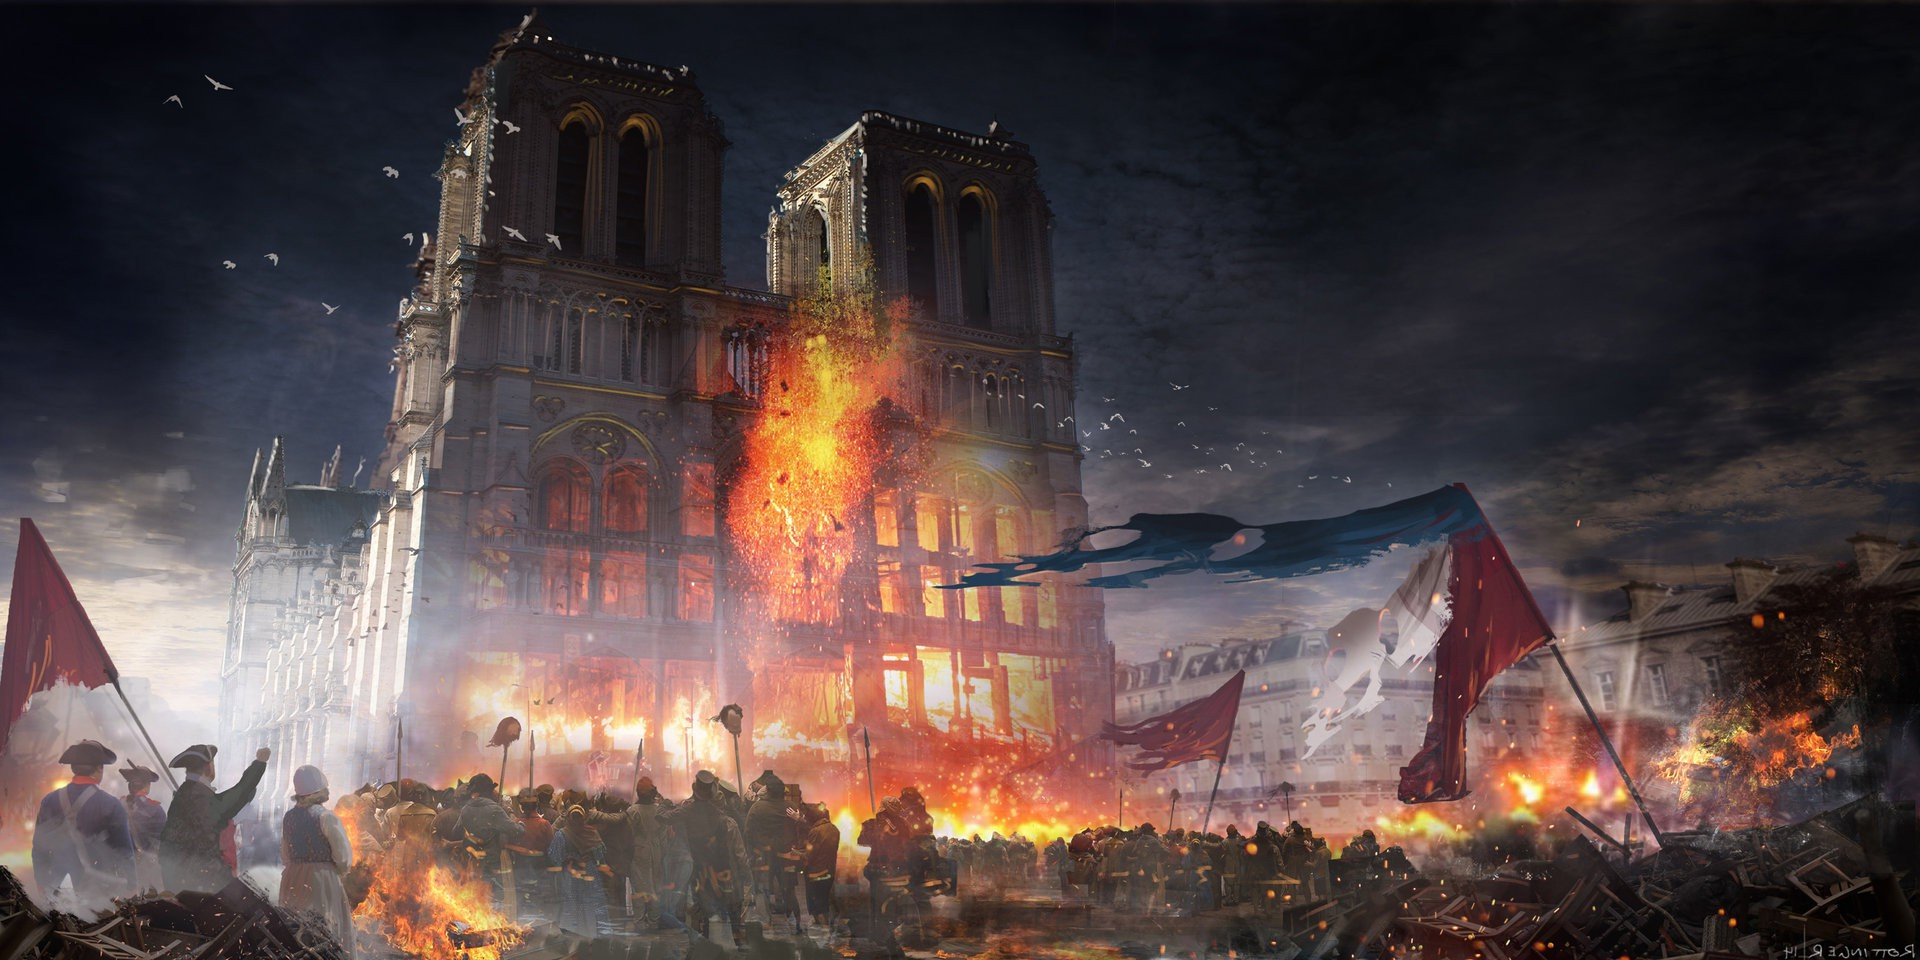 Assassins Creed Unity Hd Wallpaper Assassins Creed Unity Video Games Wallpapers Hd